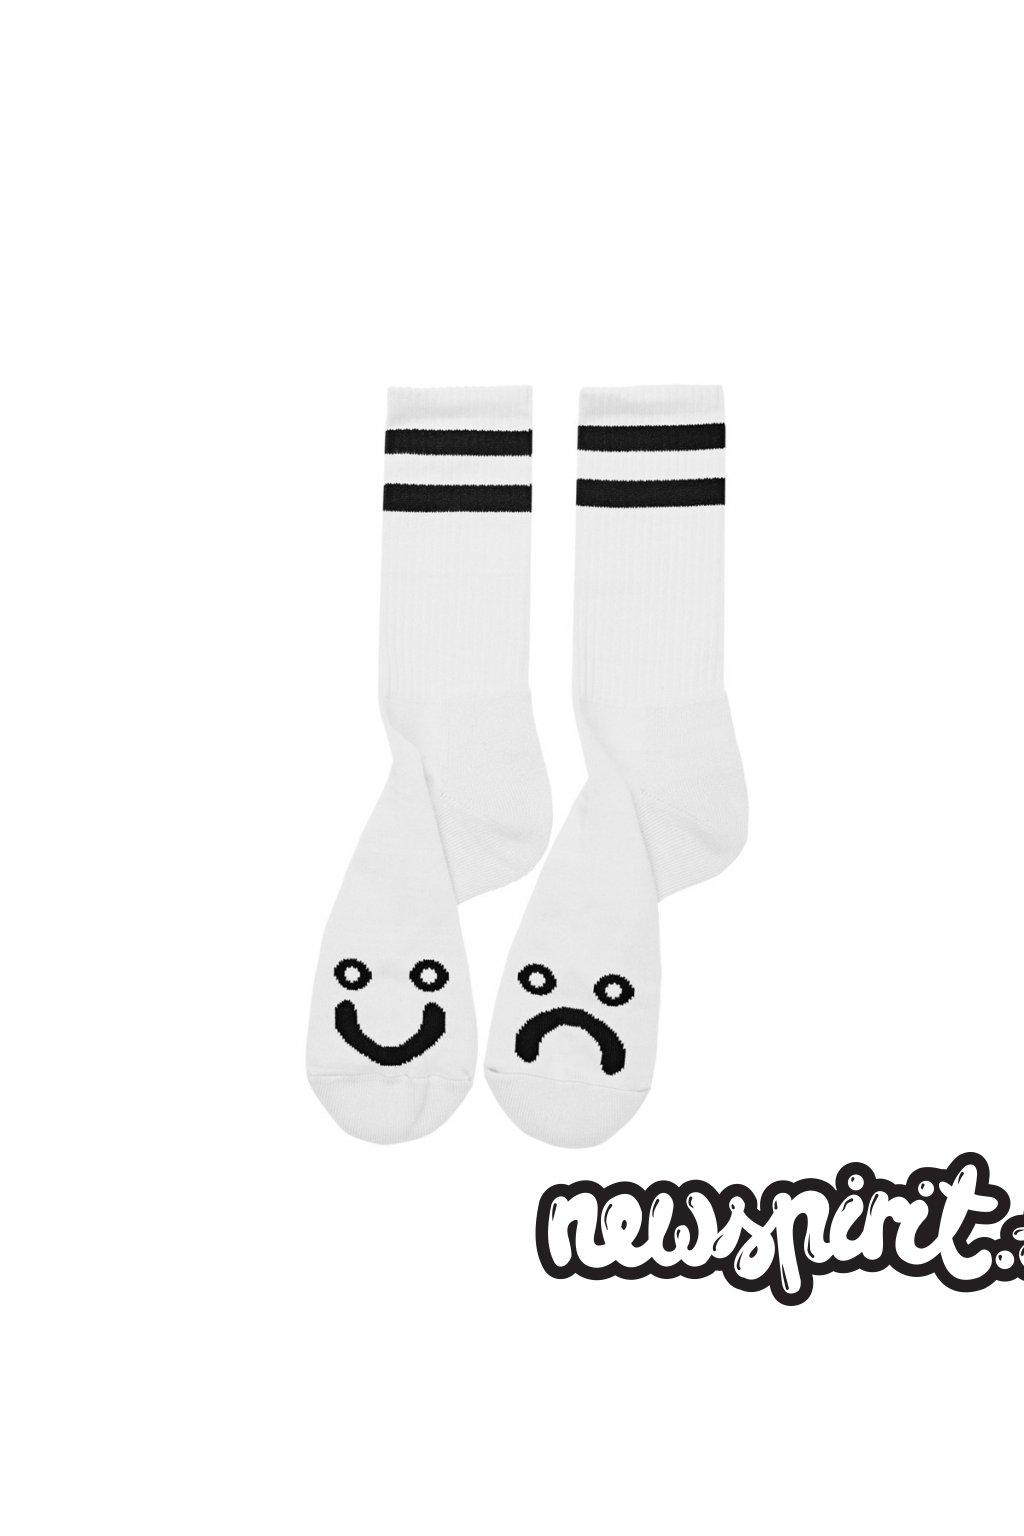 eng pl Polar Happy Sad socks white 18570 1